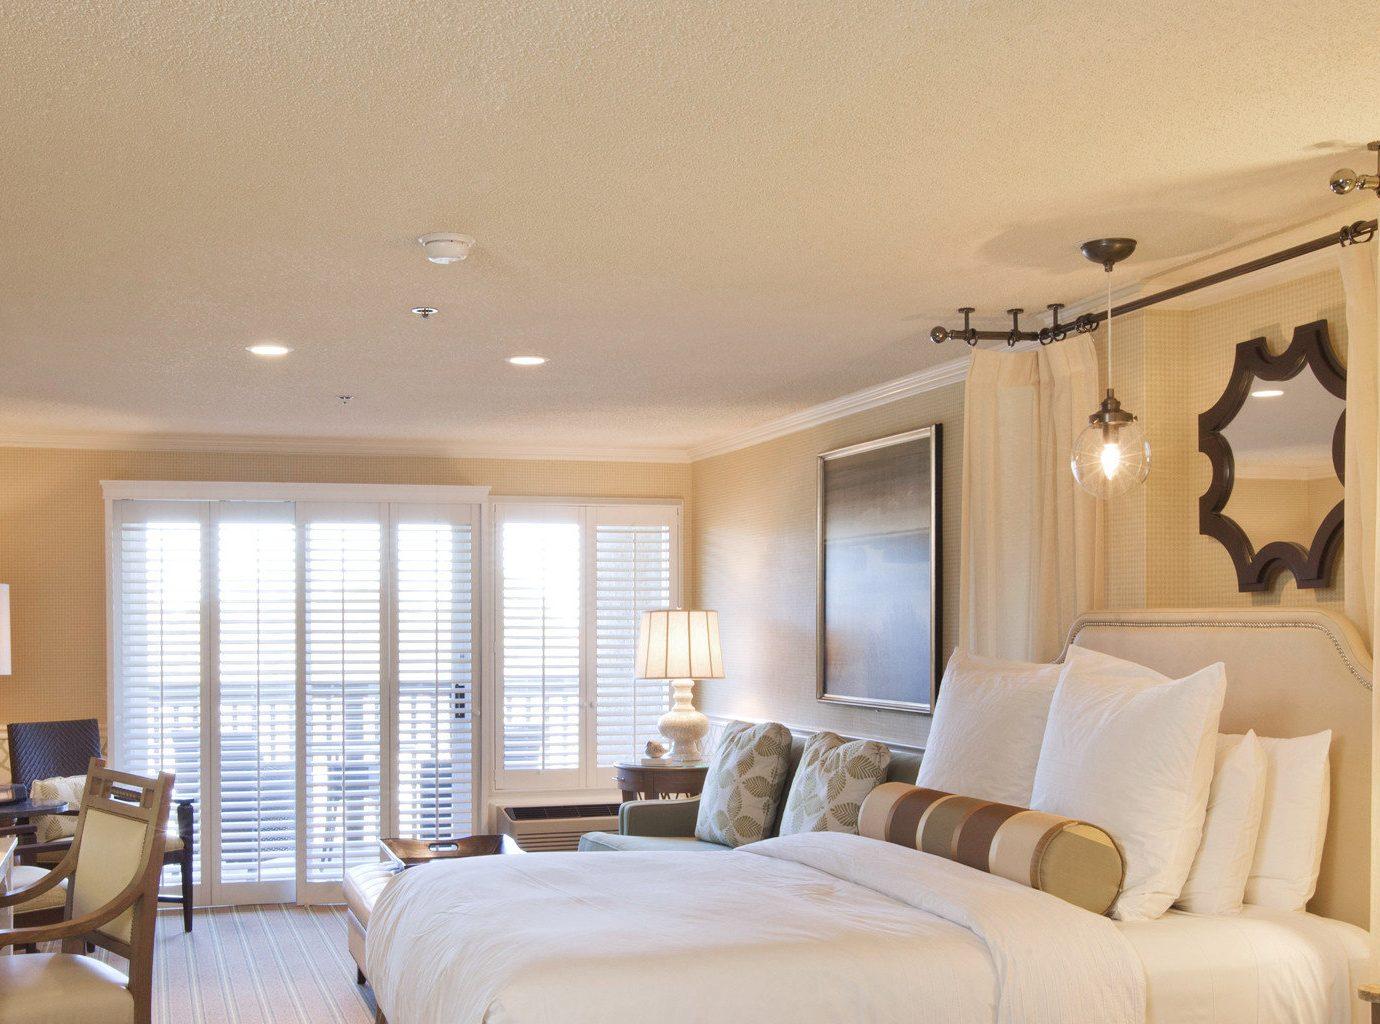 Bedroom Family Modern Resort Trip Ideas property living room Suite home condominium cottage